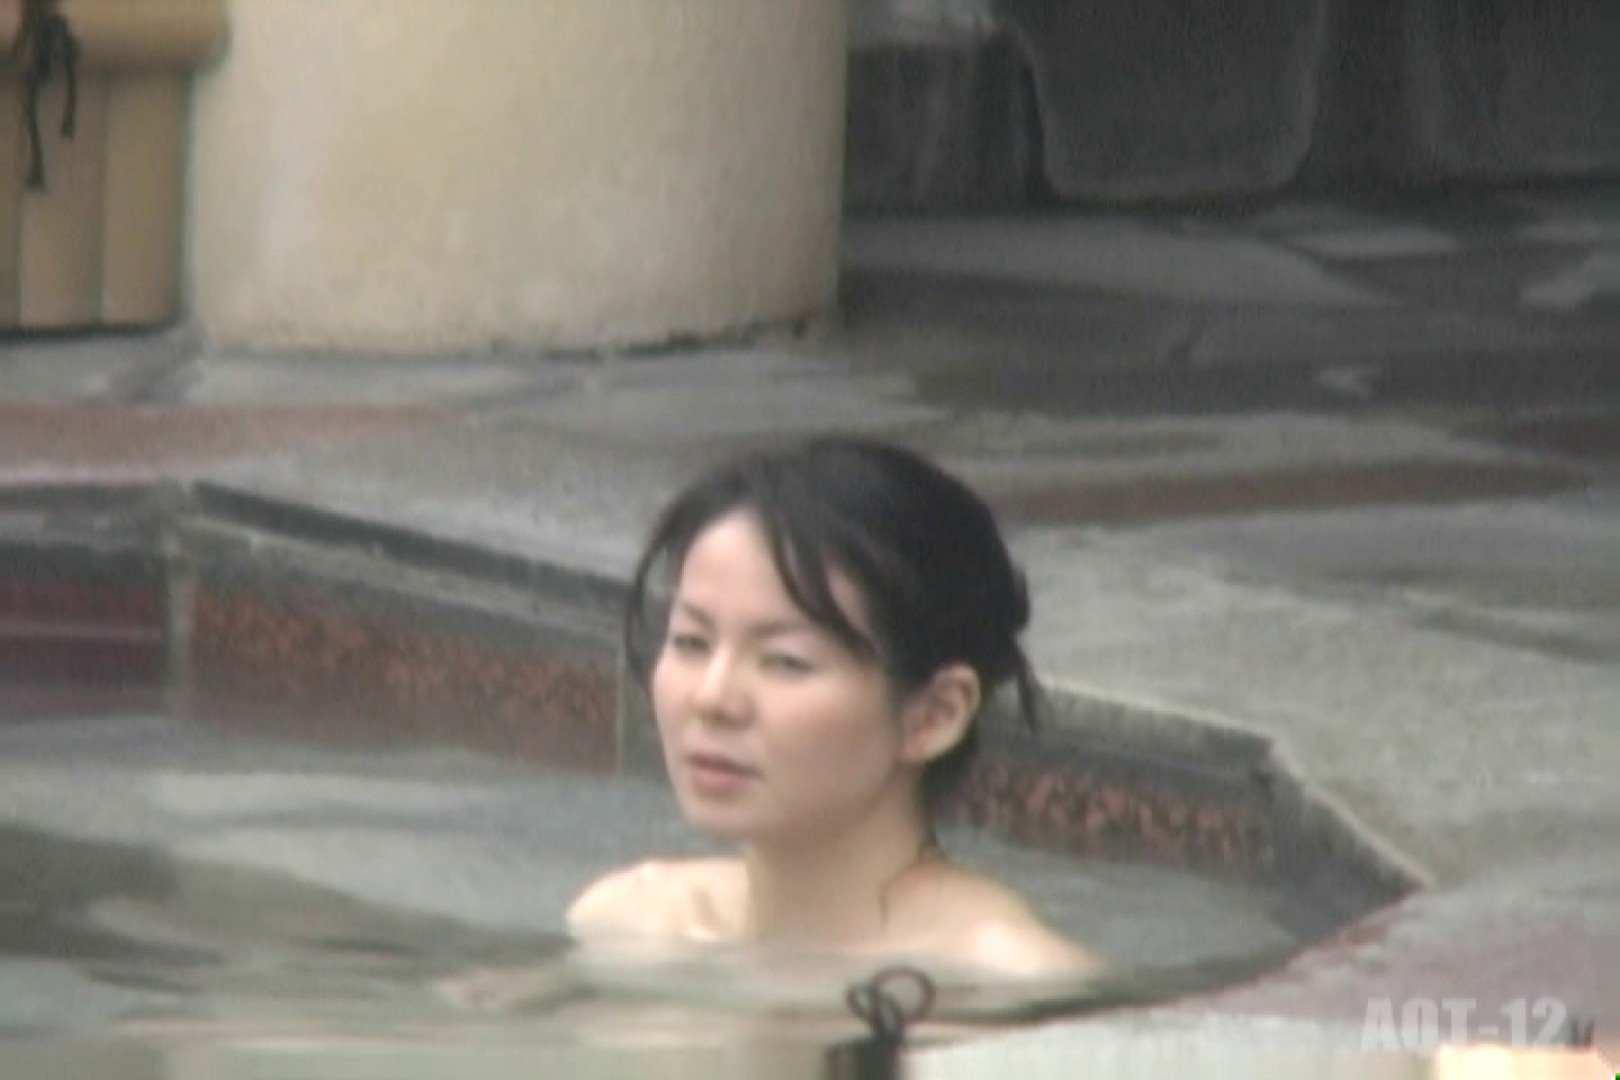 Aquaな露天風呂Vol.811 露天 | OLのプライベート  11pic 4